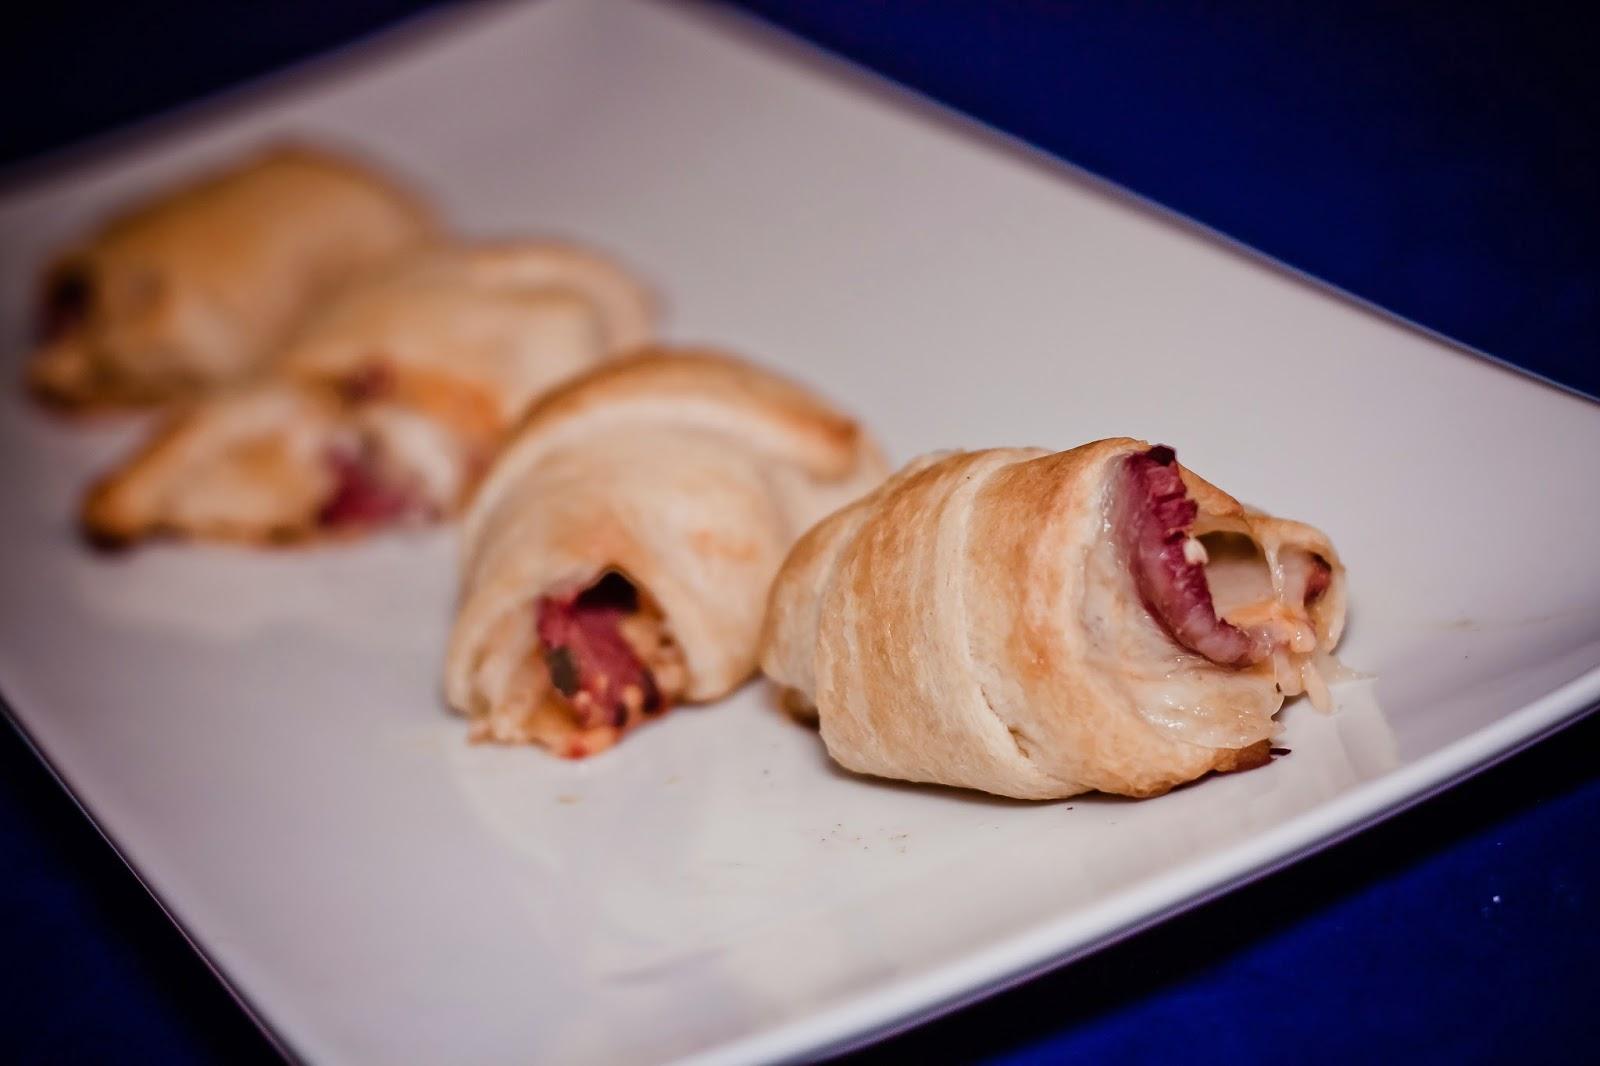 Reuben Crescent Roll Appetizers